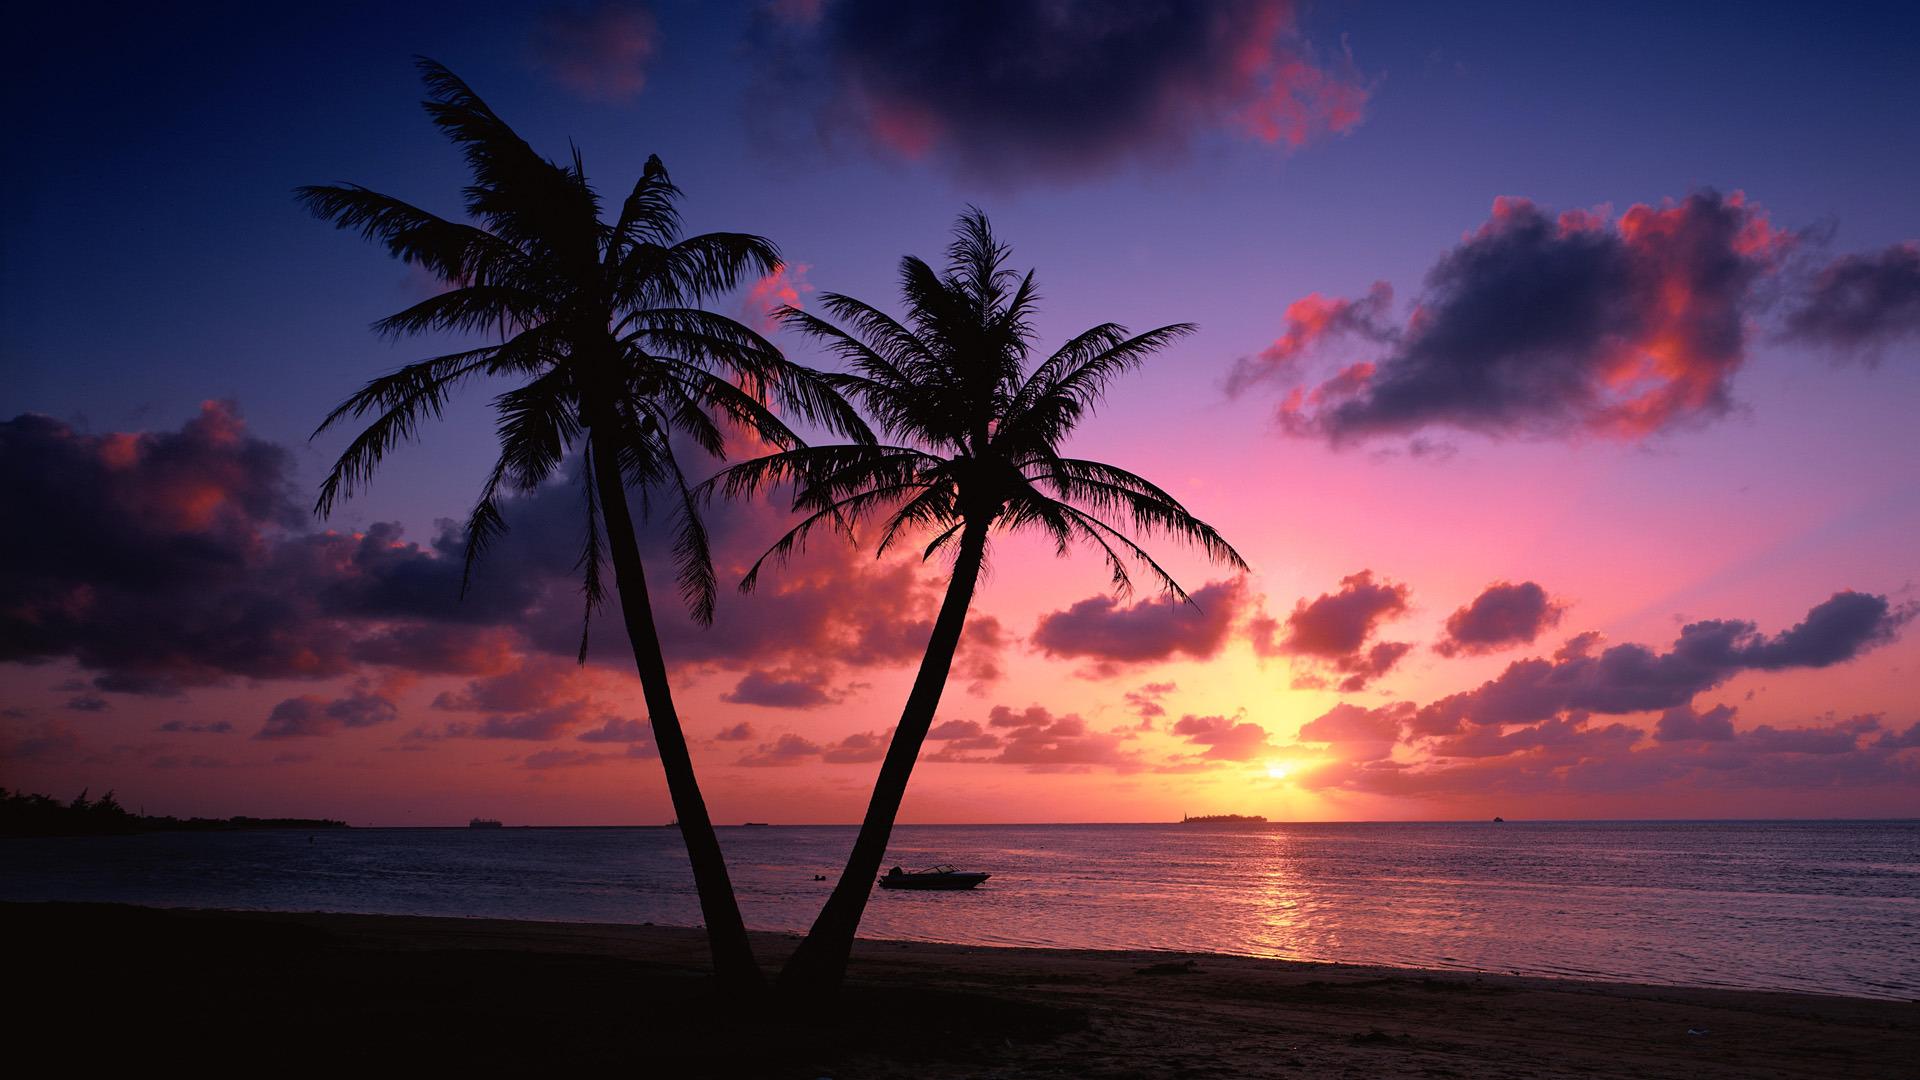 Landscape Sunset 5287